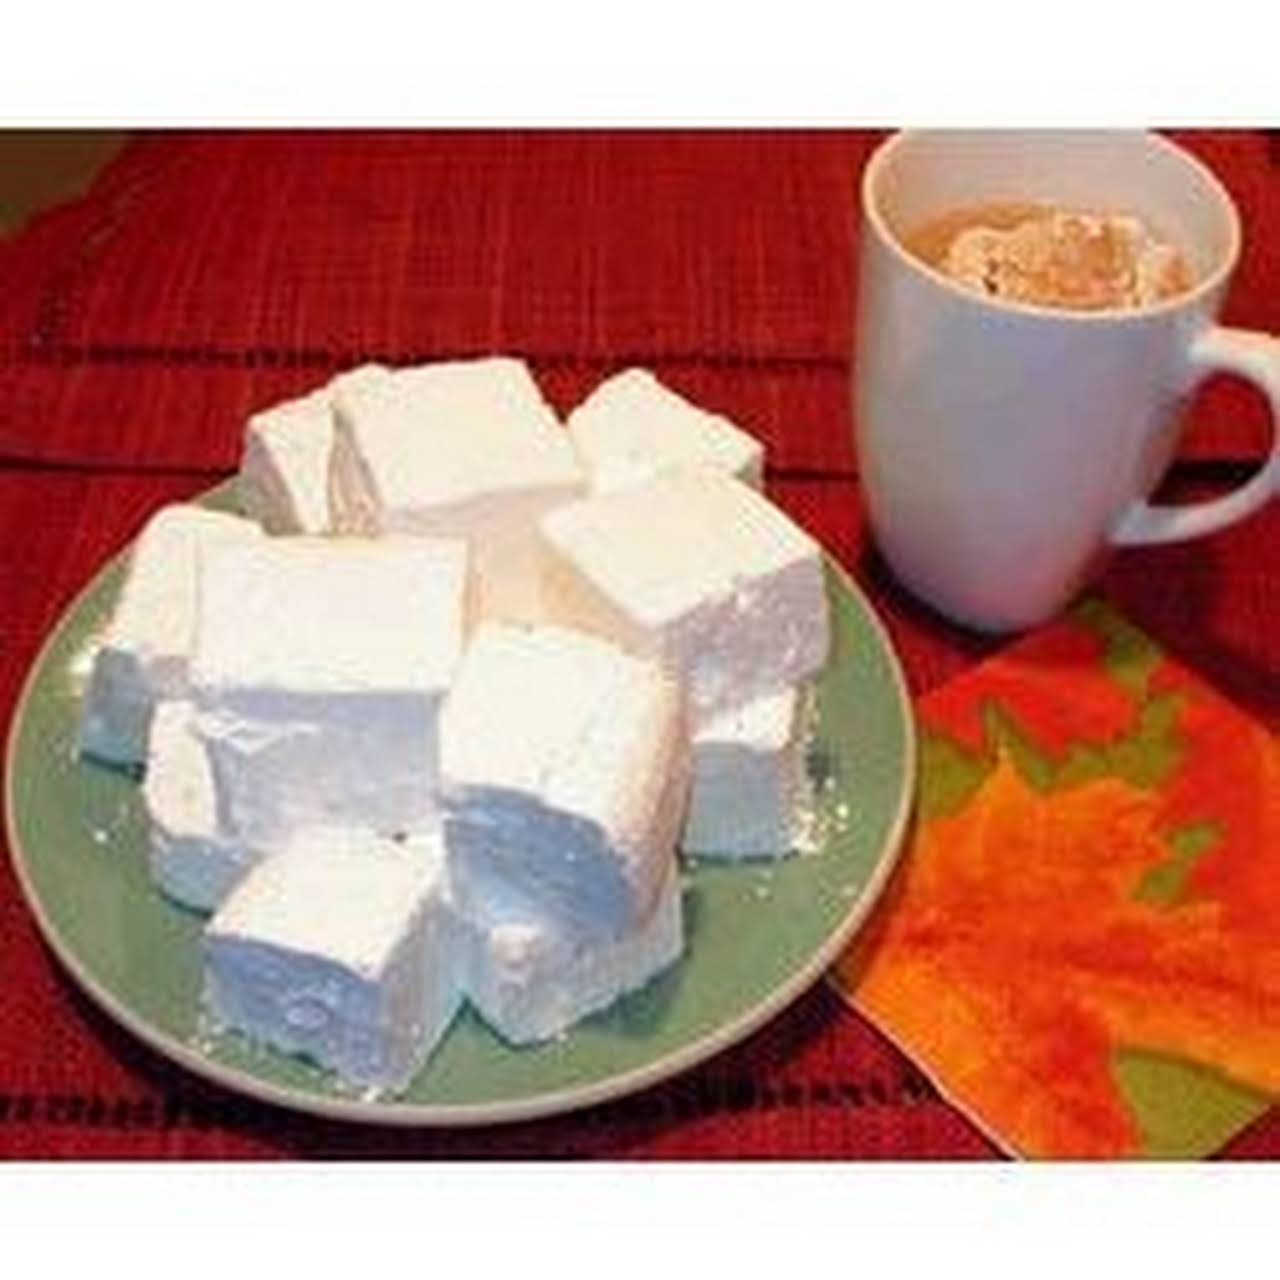 Homemade Marshmallows II